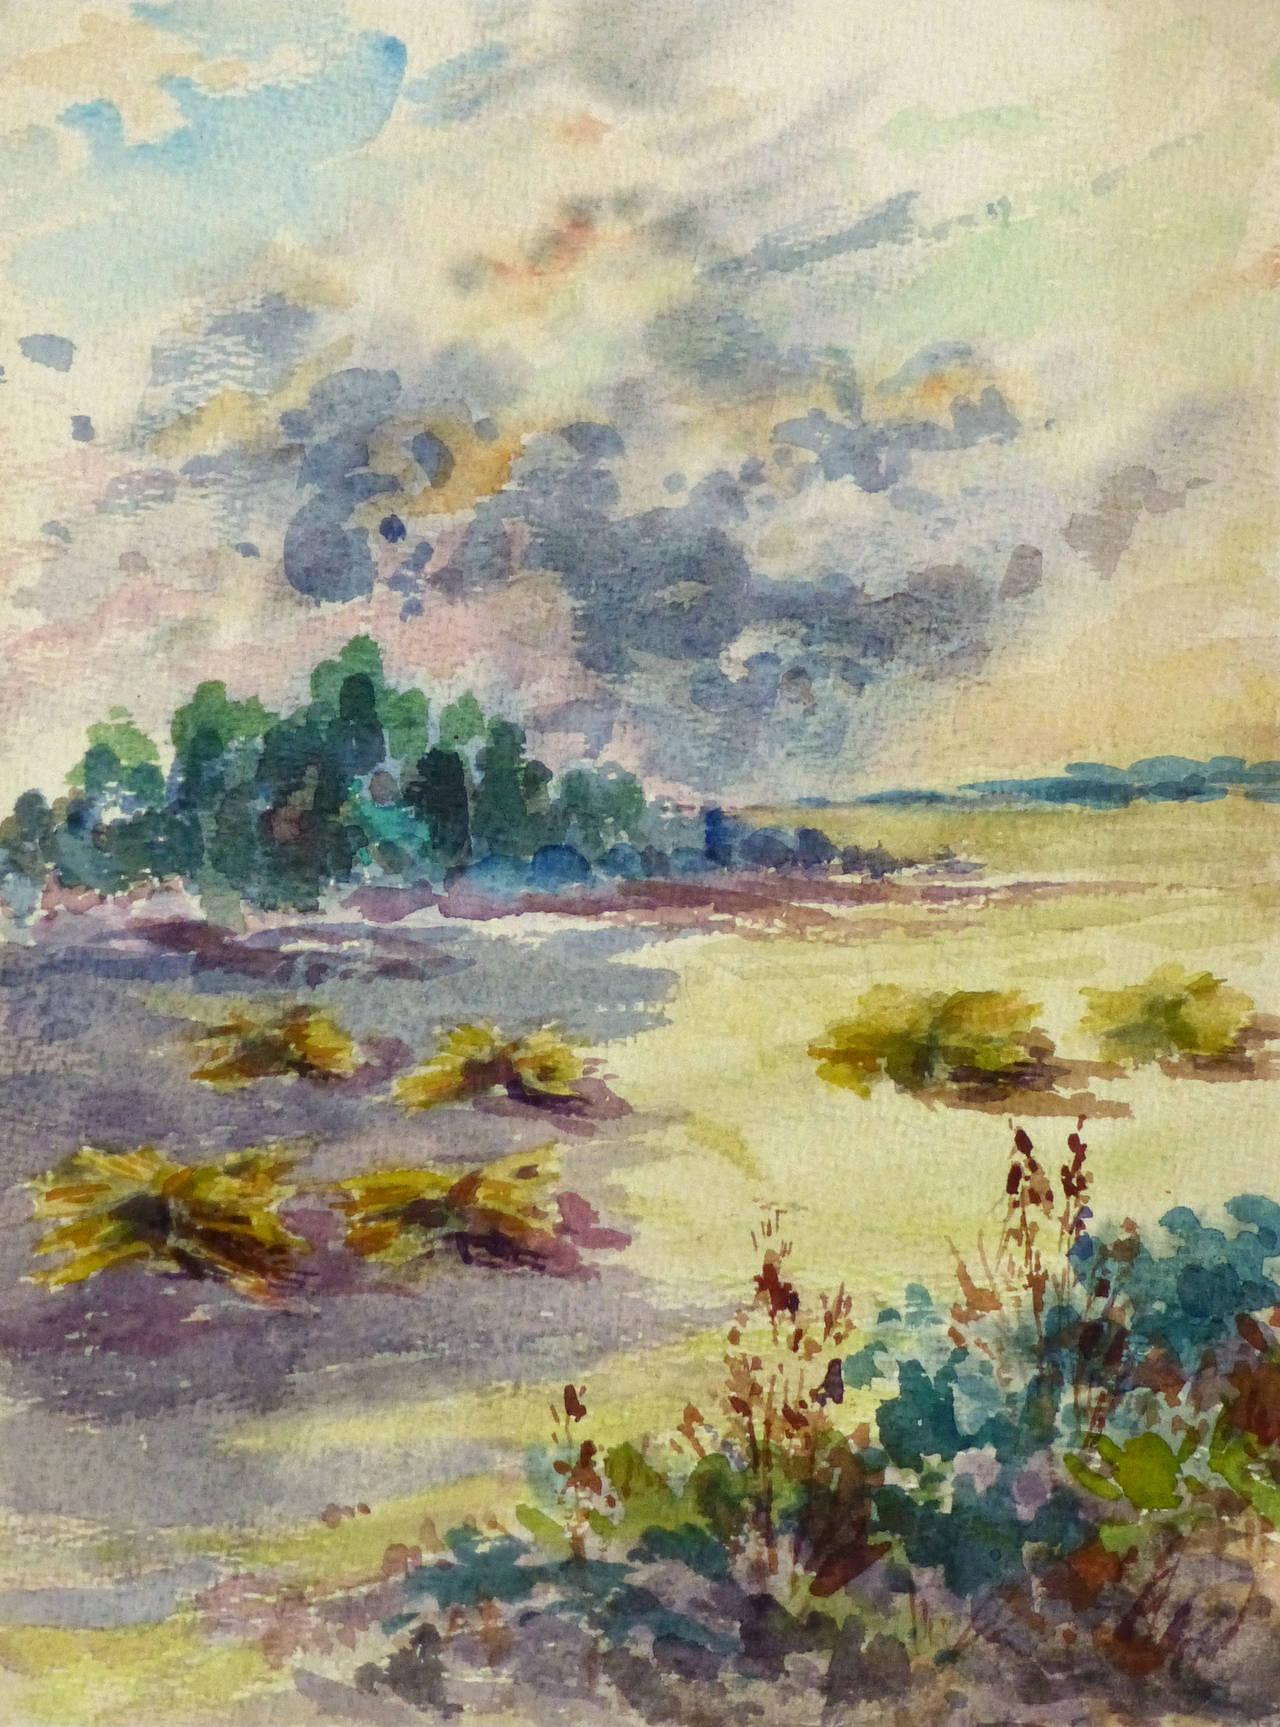 Roger Tochon Landscape Art - Vintage French Watercolor Landscape - The Hay Field